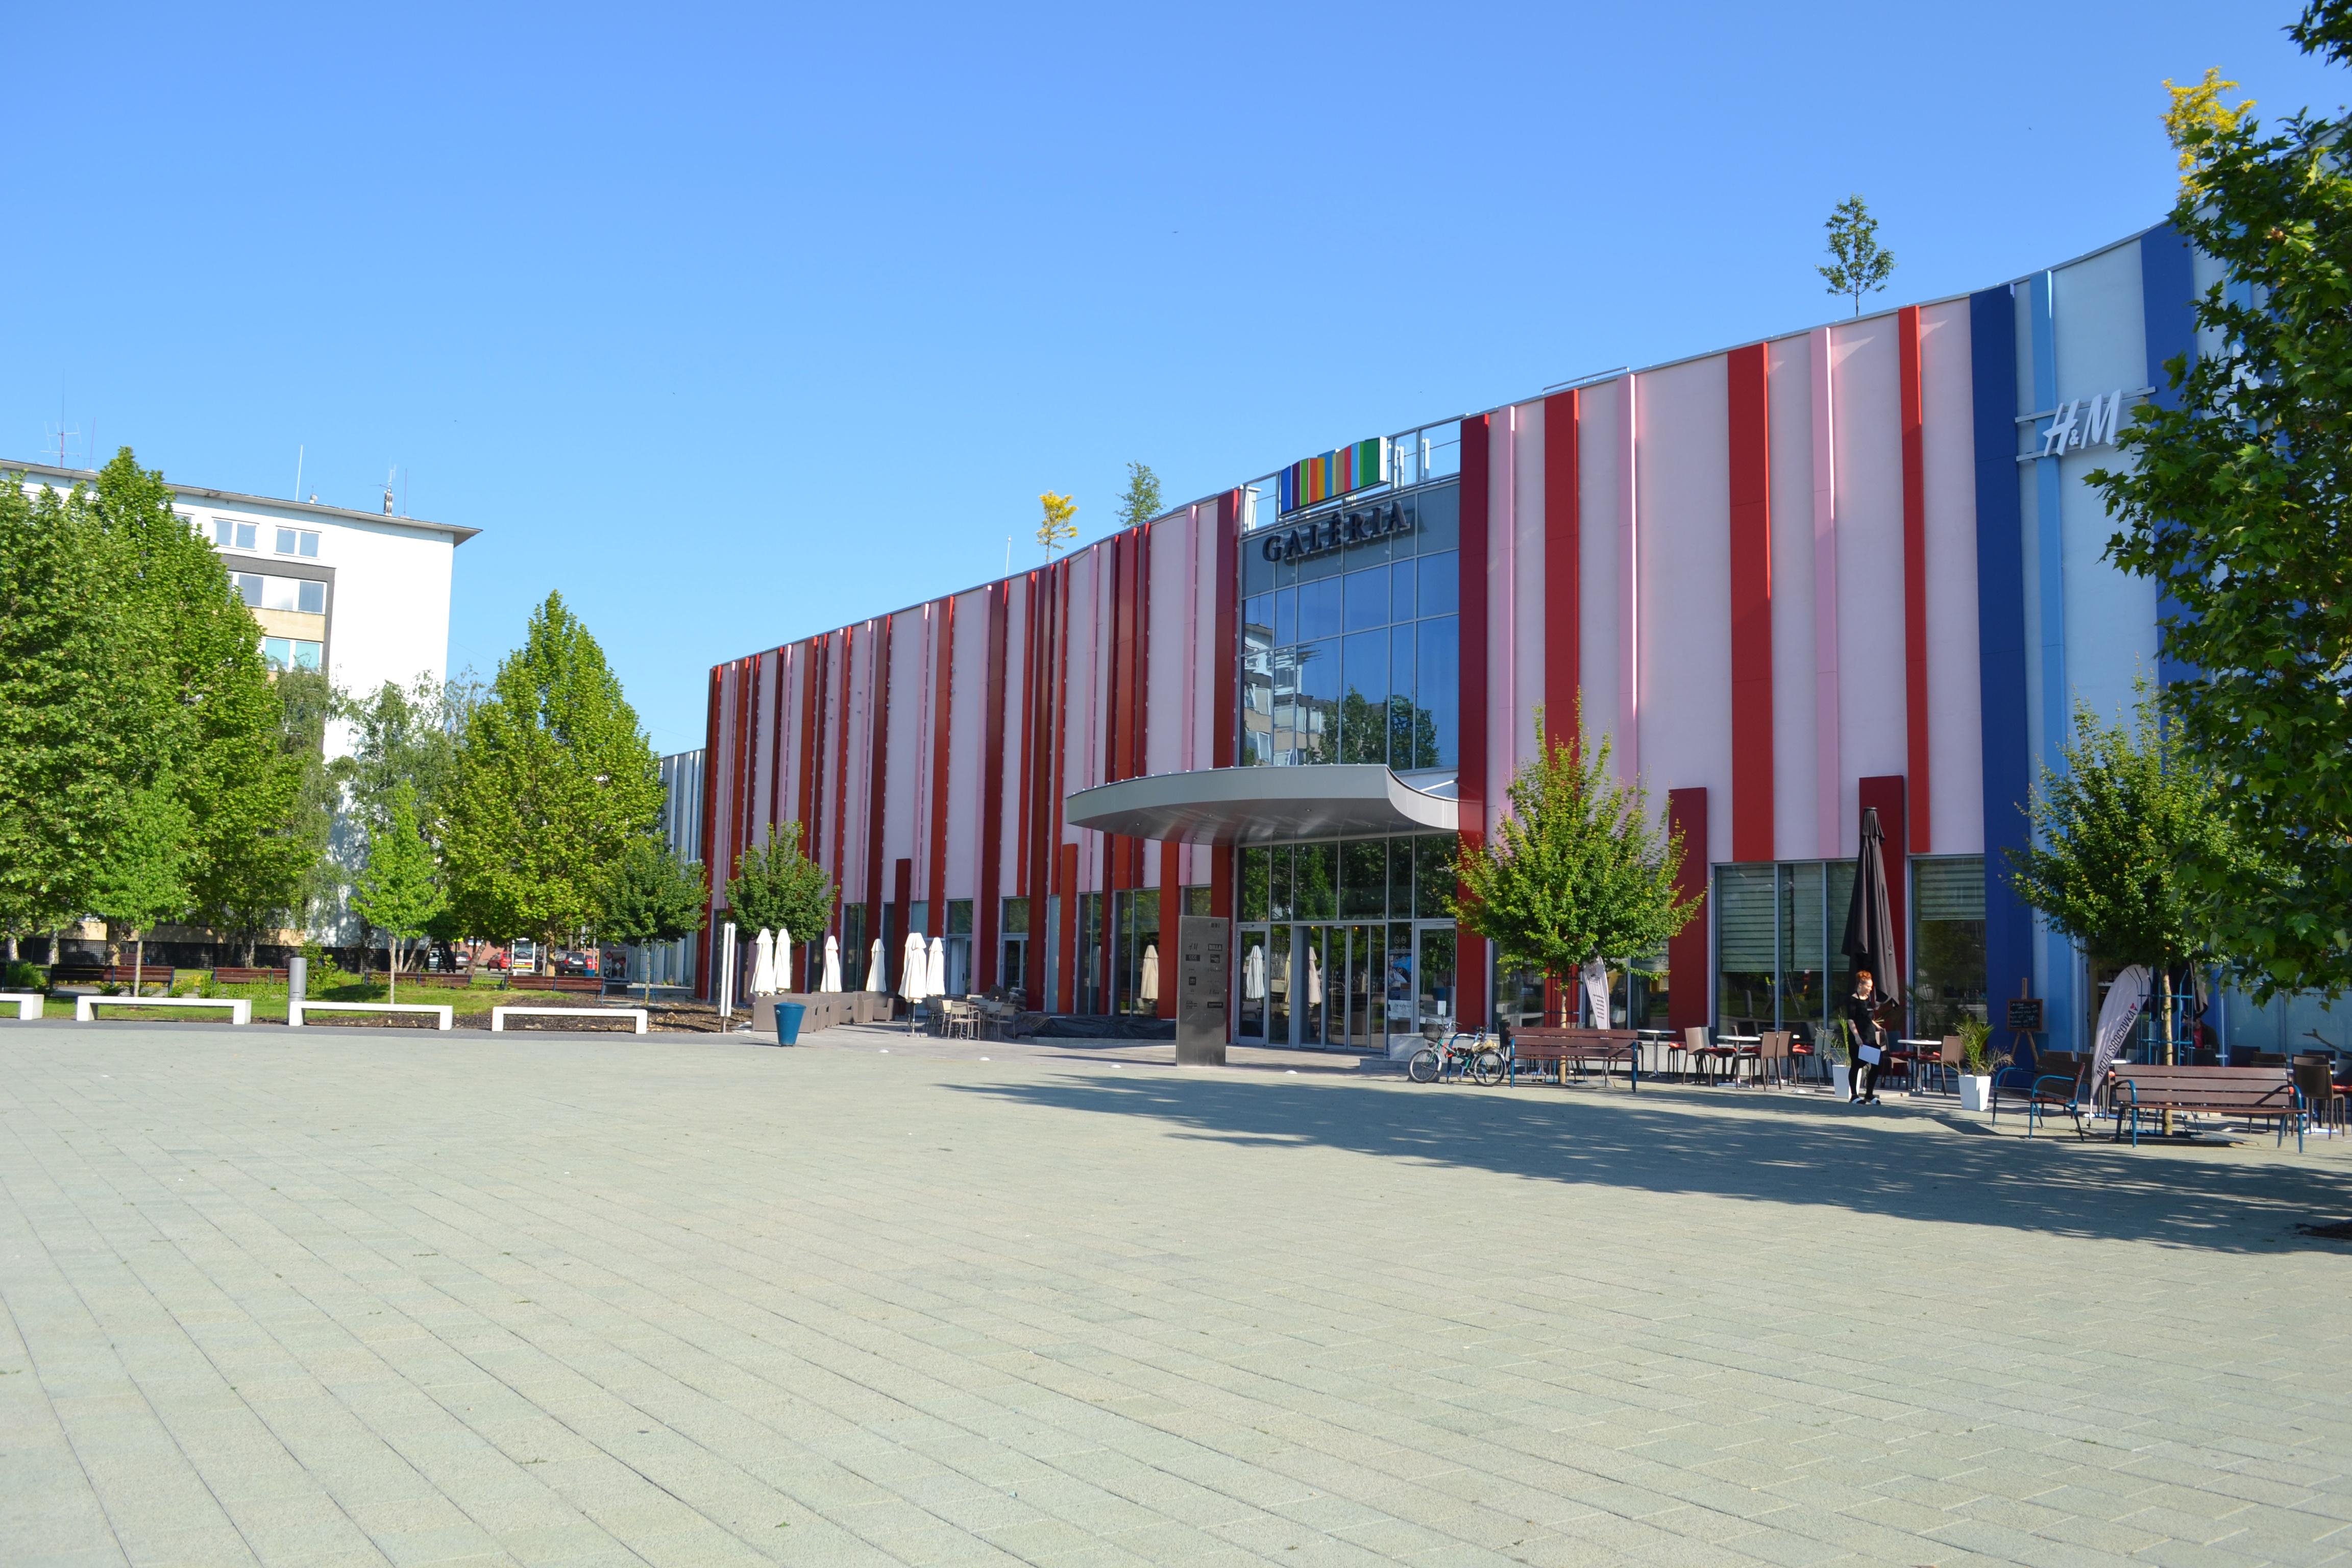 File Galéria Lučenec (7).jpg - Wikimedia Commons 8dd192dbd2a